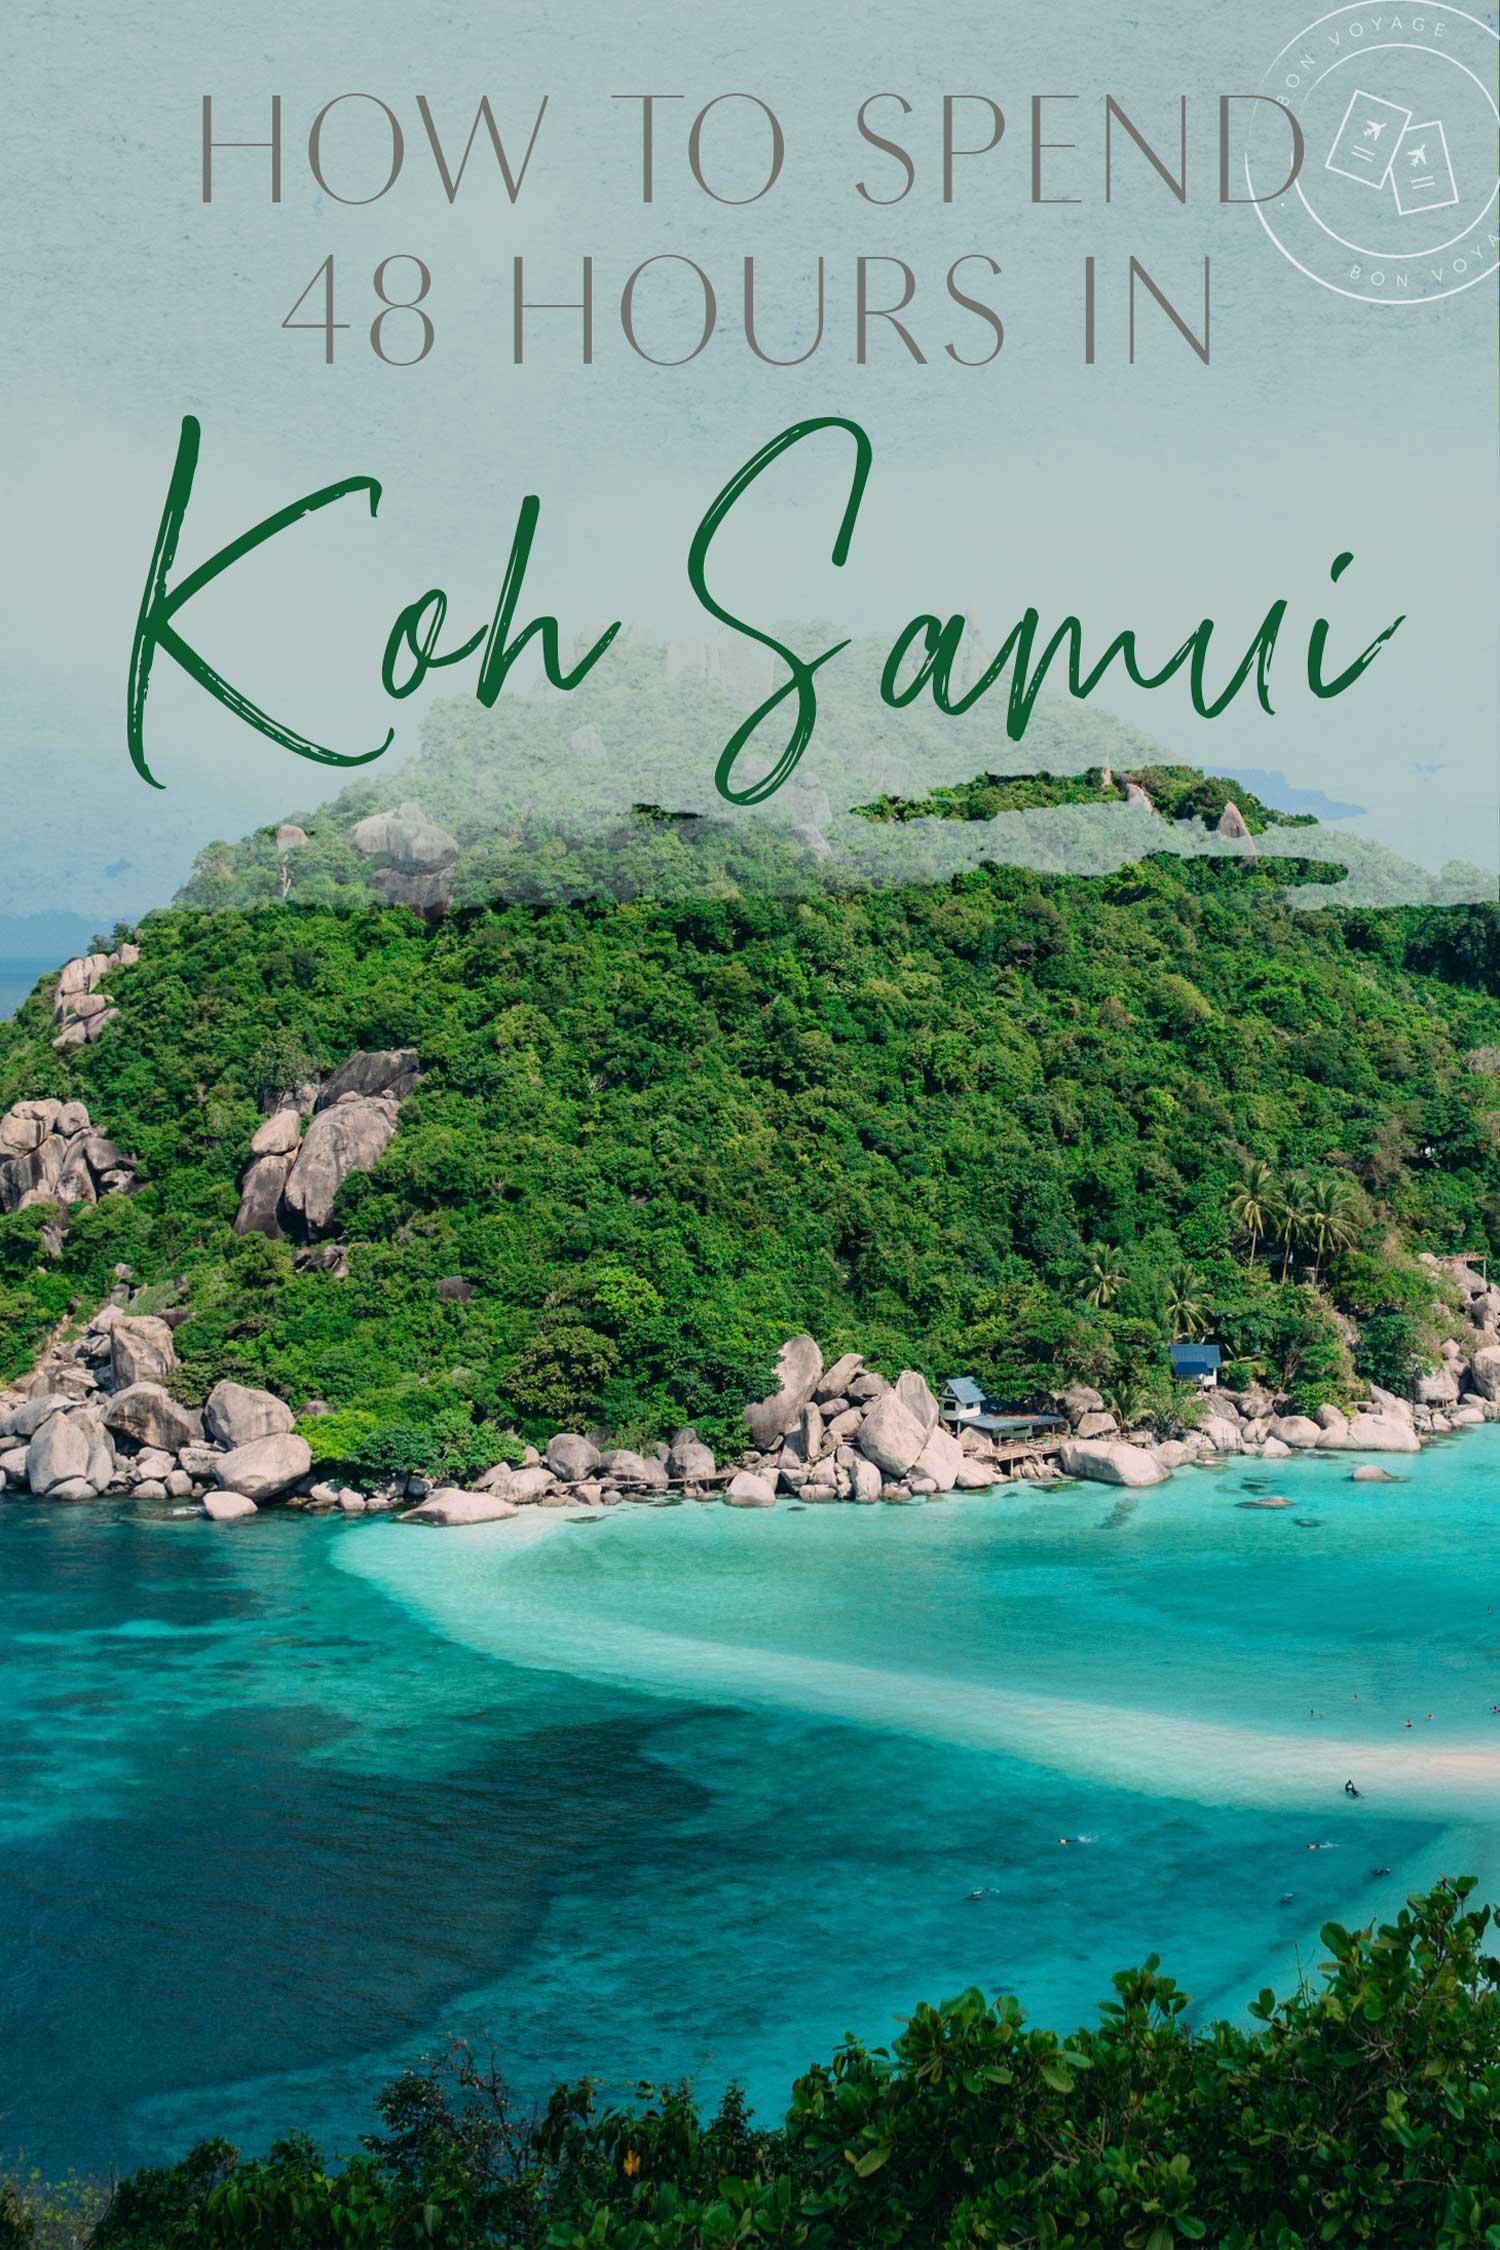 koh-samui ▷ Cómo pasar 48 horas en Koh Samui